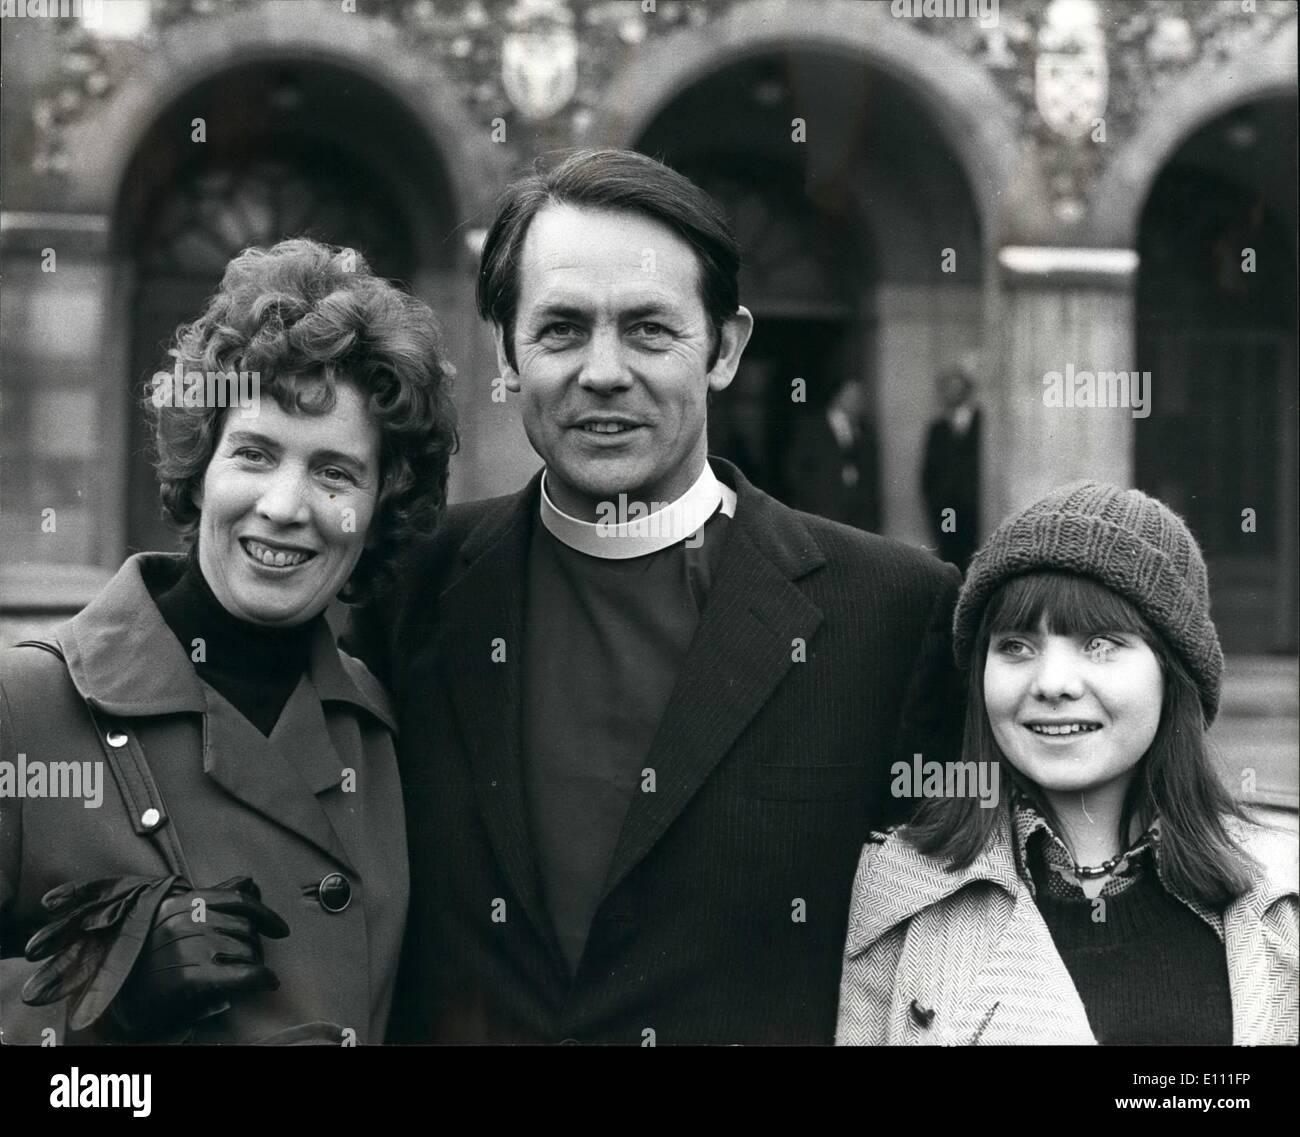 Jan. 01, 1975 - David Sheppard to be next Bishop of Liverpool: David Sheppard, Suffragan Bishop of Wolwich, and farmer England - Stock Image